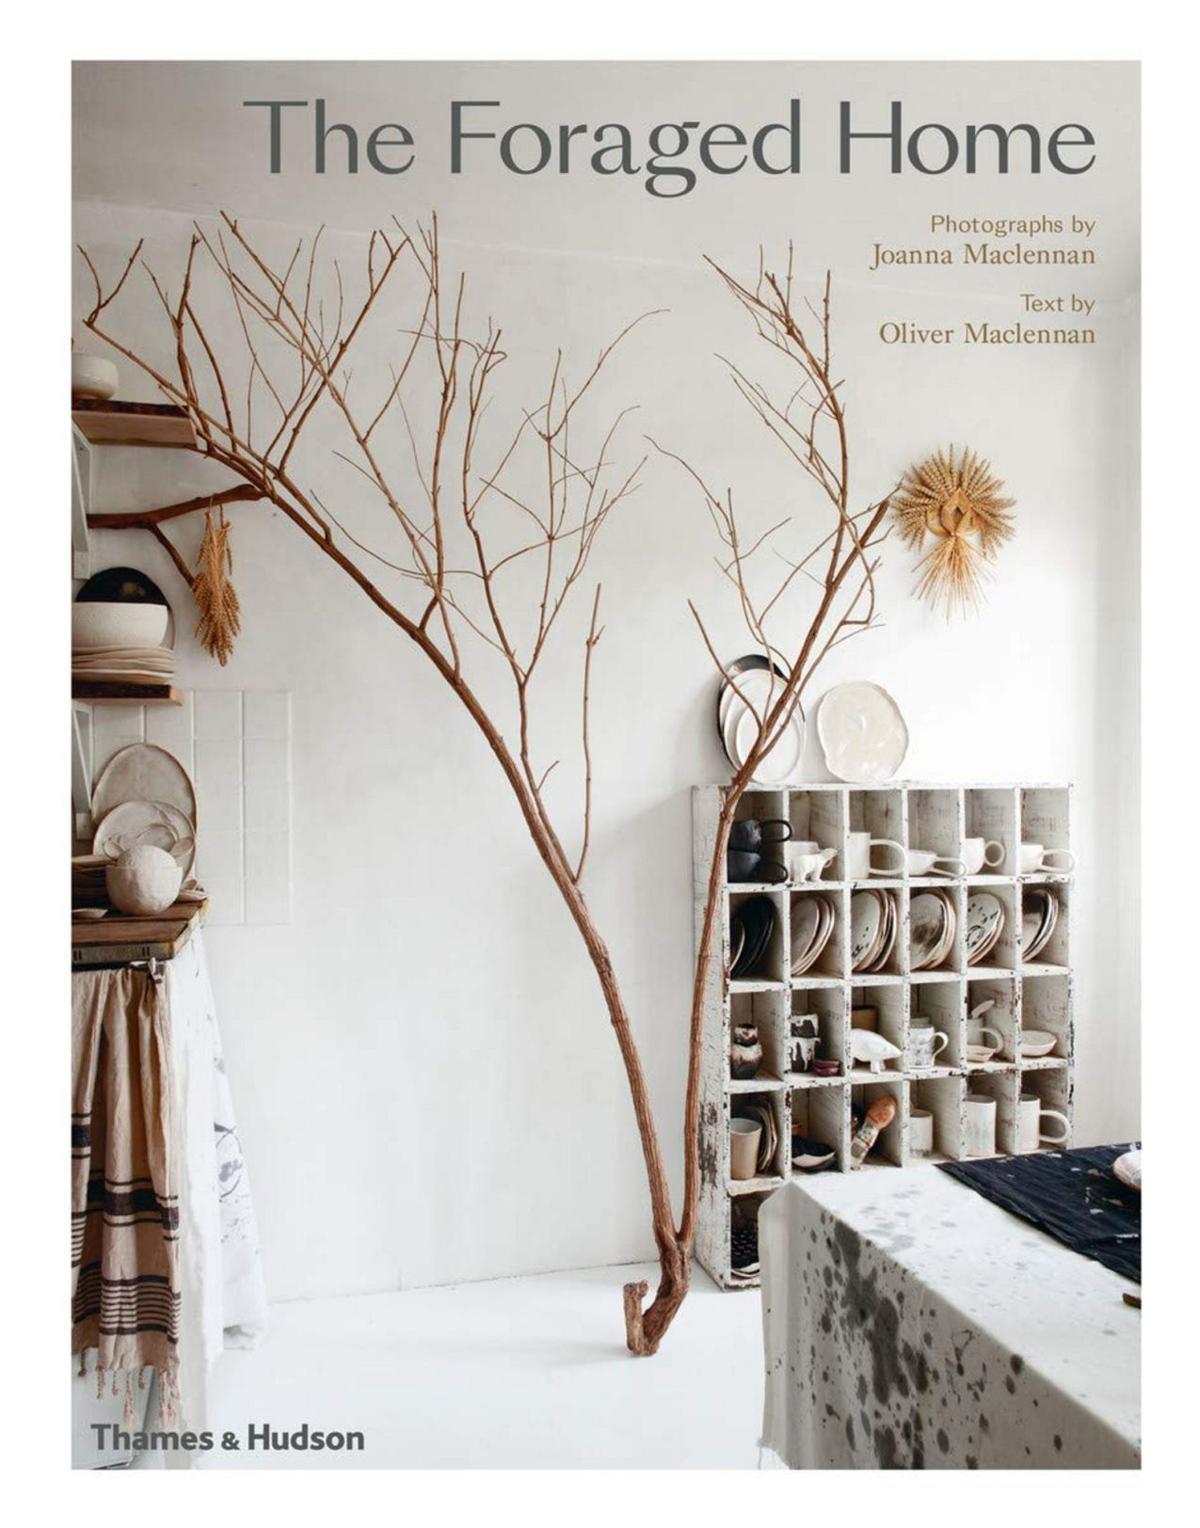 7 books to help shake up home decor